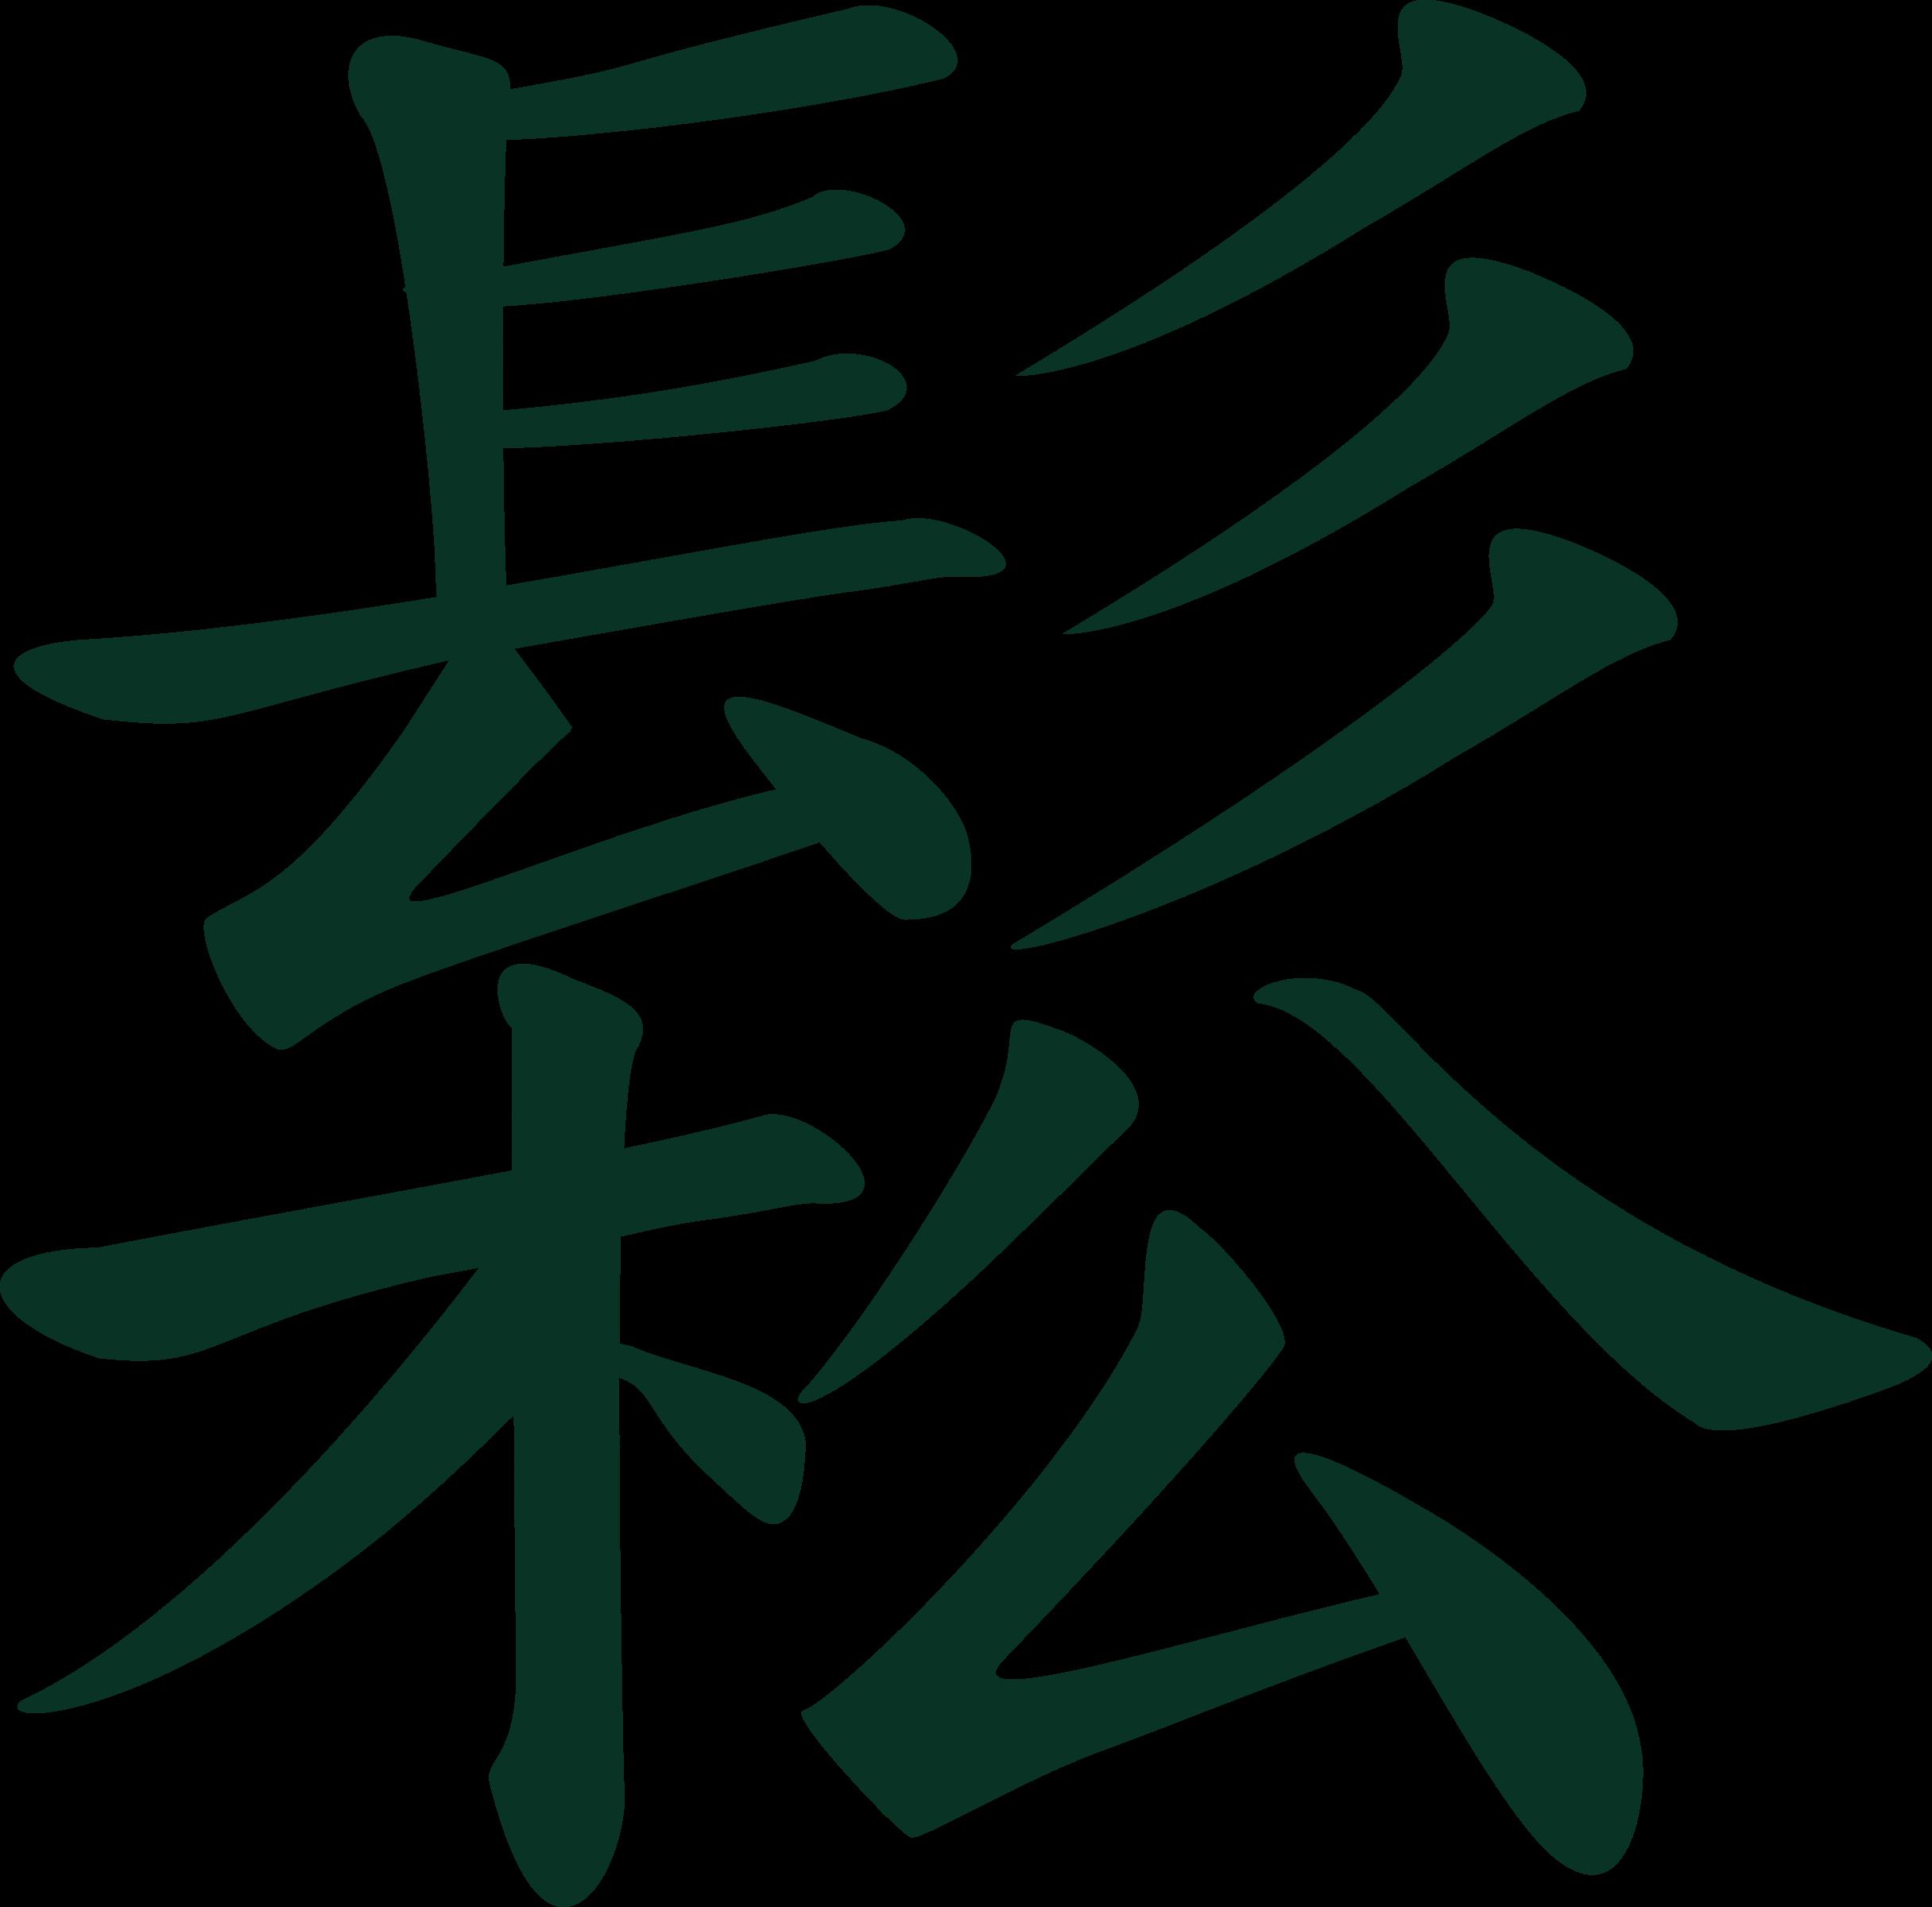 China clipart mandarin language. Sung chinese taichi meaning